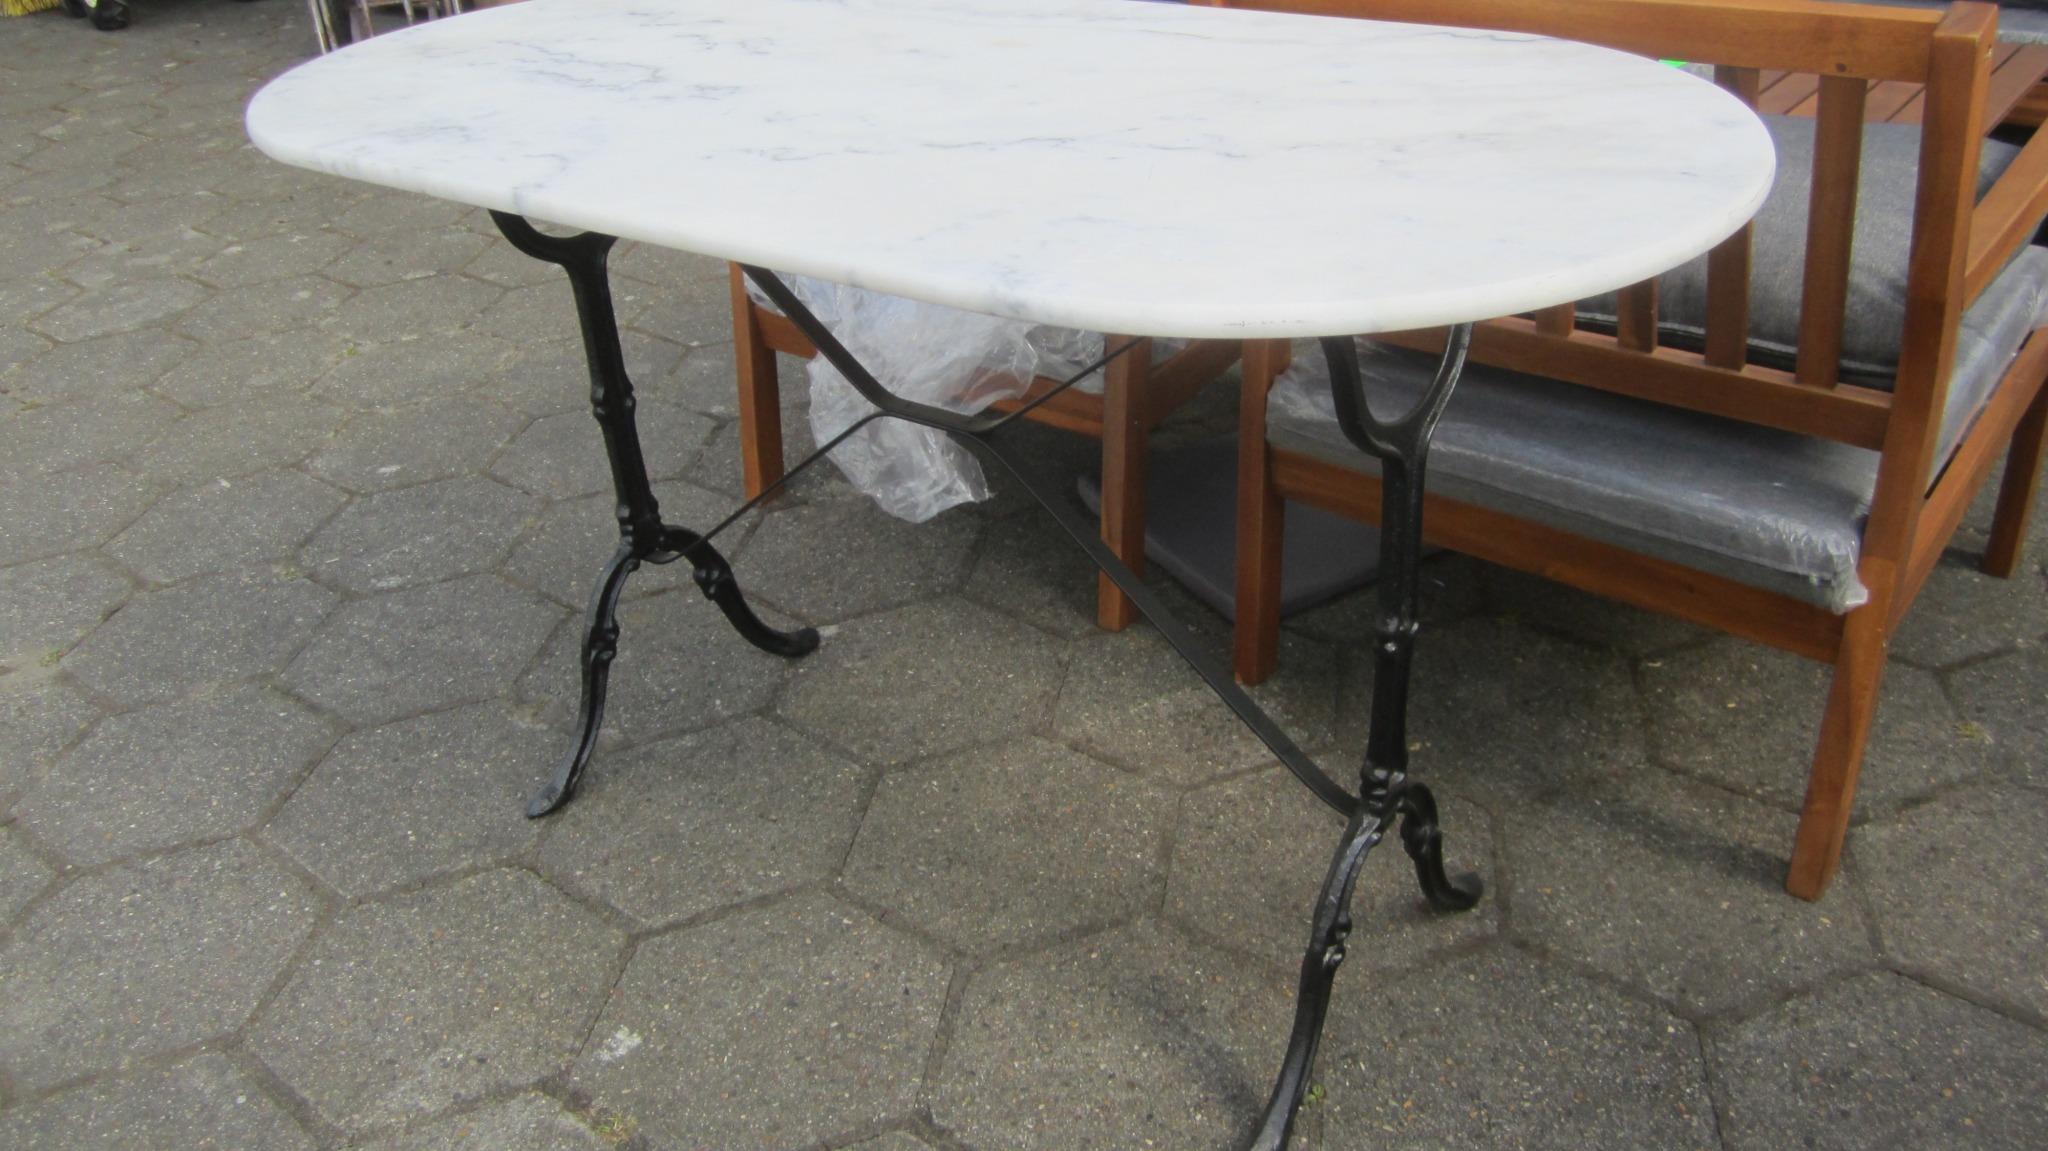 Cafe bord